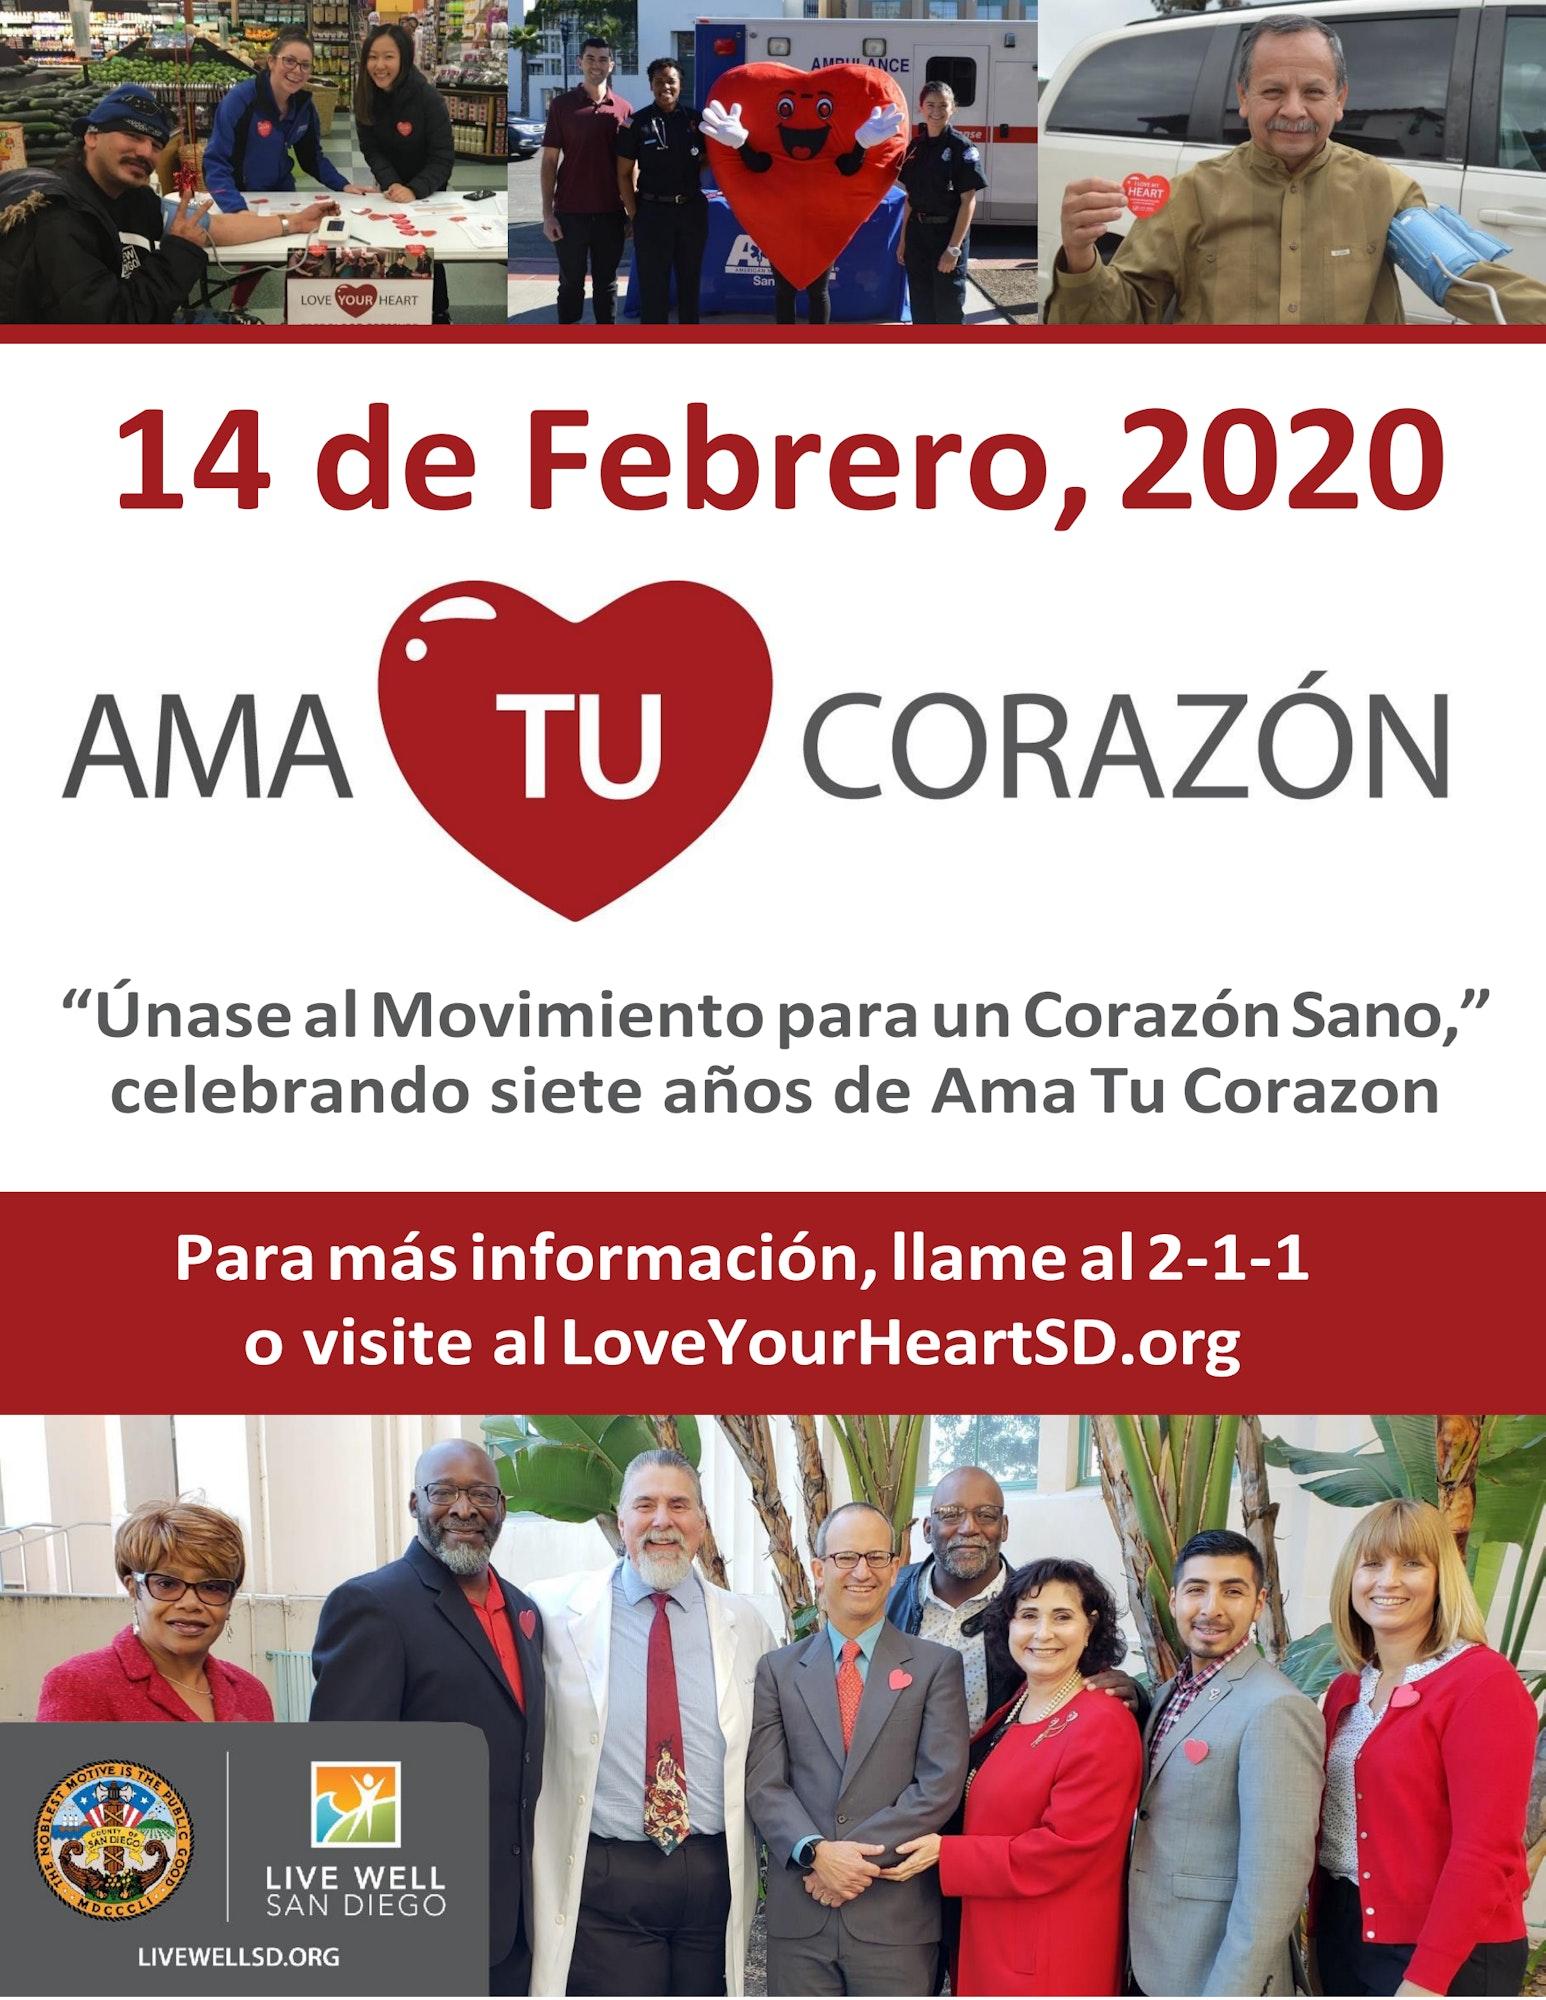 Anuncio de Ama tu Corazon, 14 de febrero 2020. Para mas informacion visite loveyourheartsd.org o llame al 2-1-1